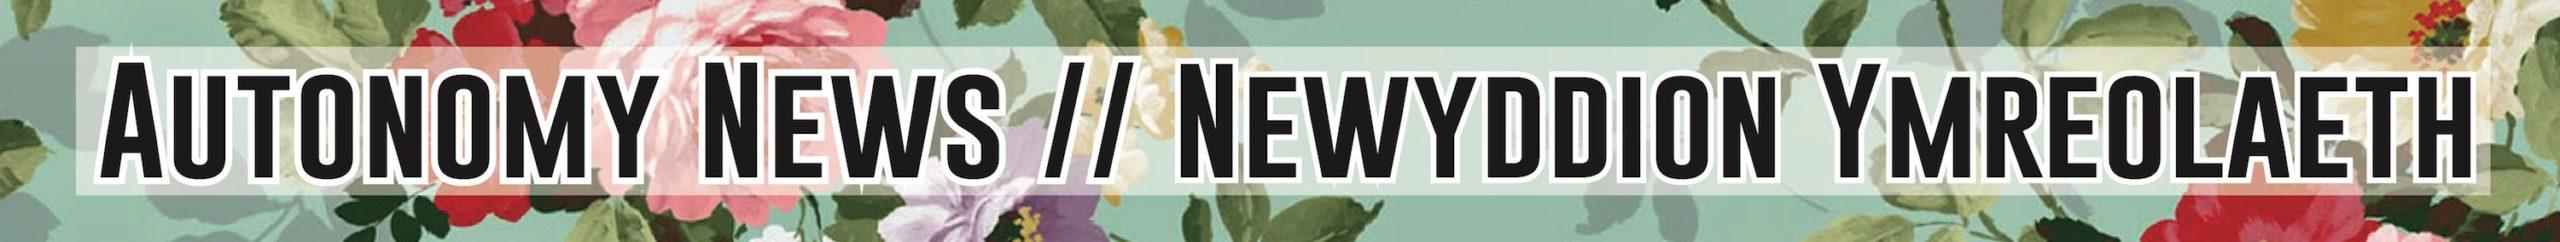 Autonomy News banner